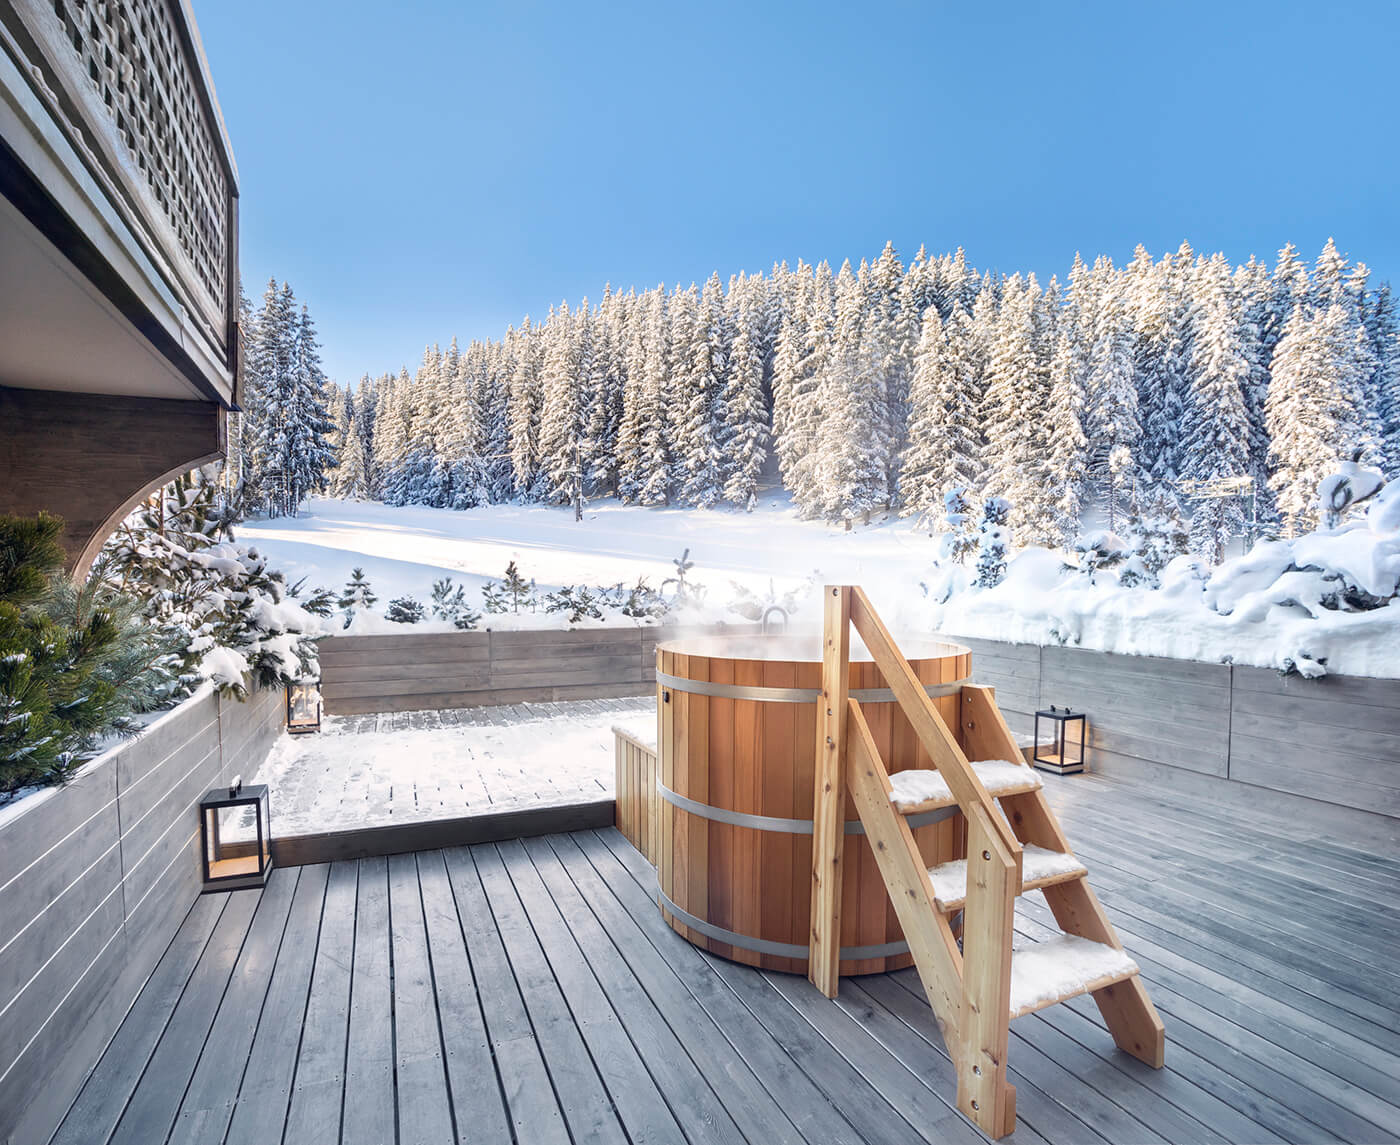 Suite Ski Piste with Hot Tub